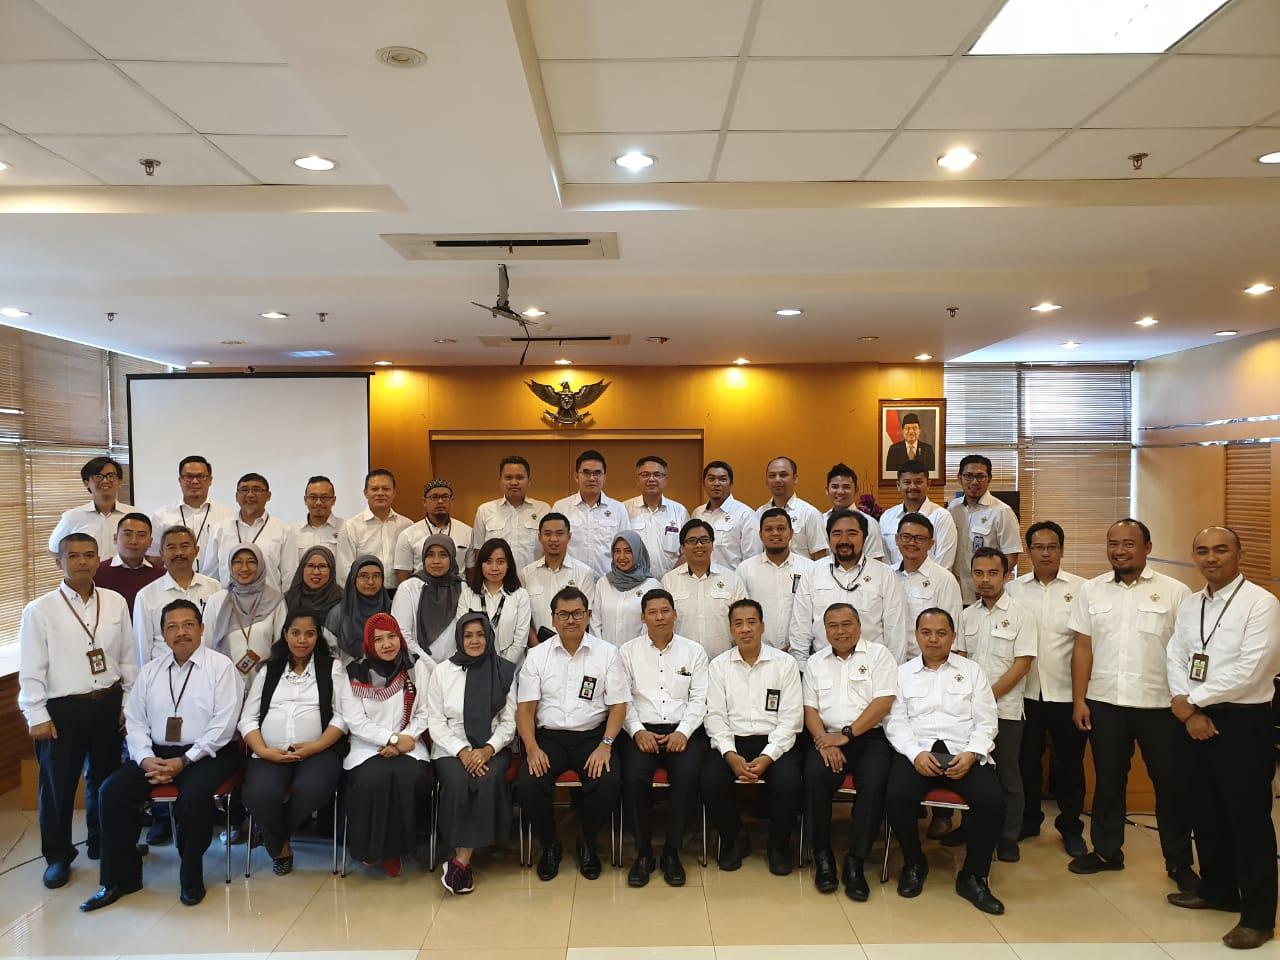 Kepala Kanwil DJKN Jawa Barat Menerima Peserta Studi Banding Pemahaman Revaluasi BMN dari BPK